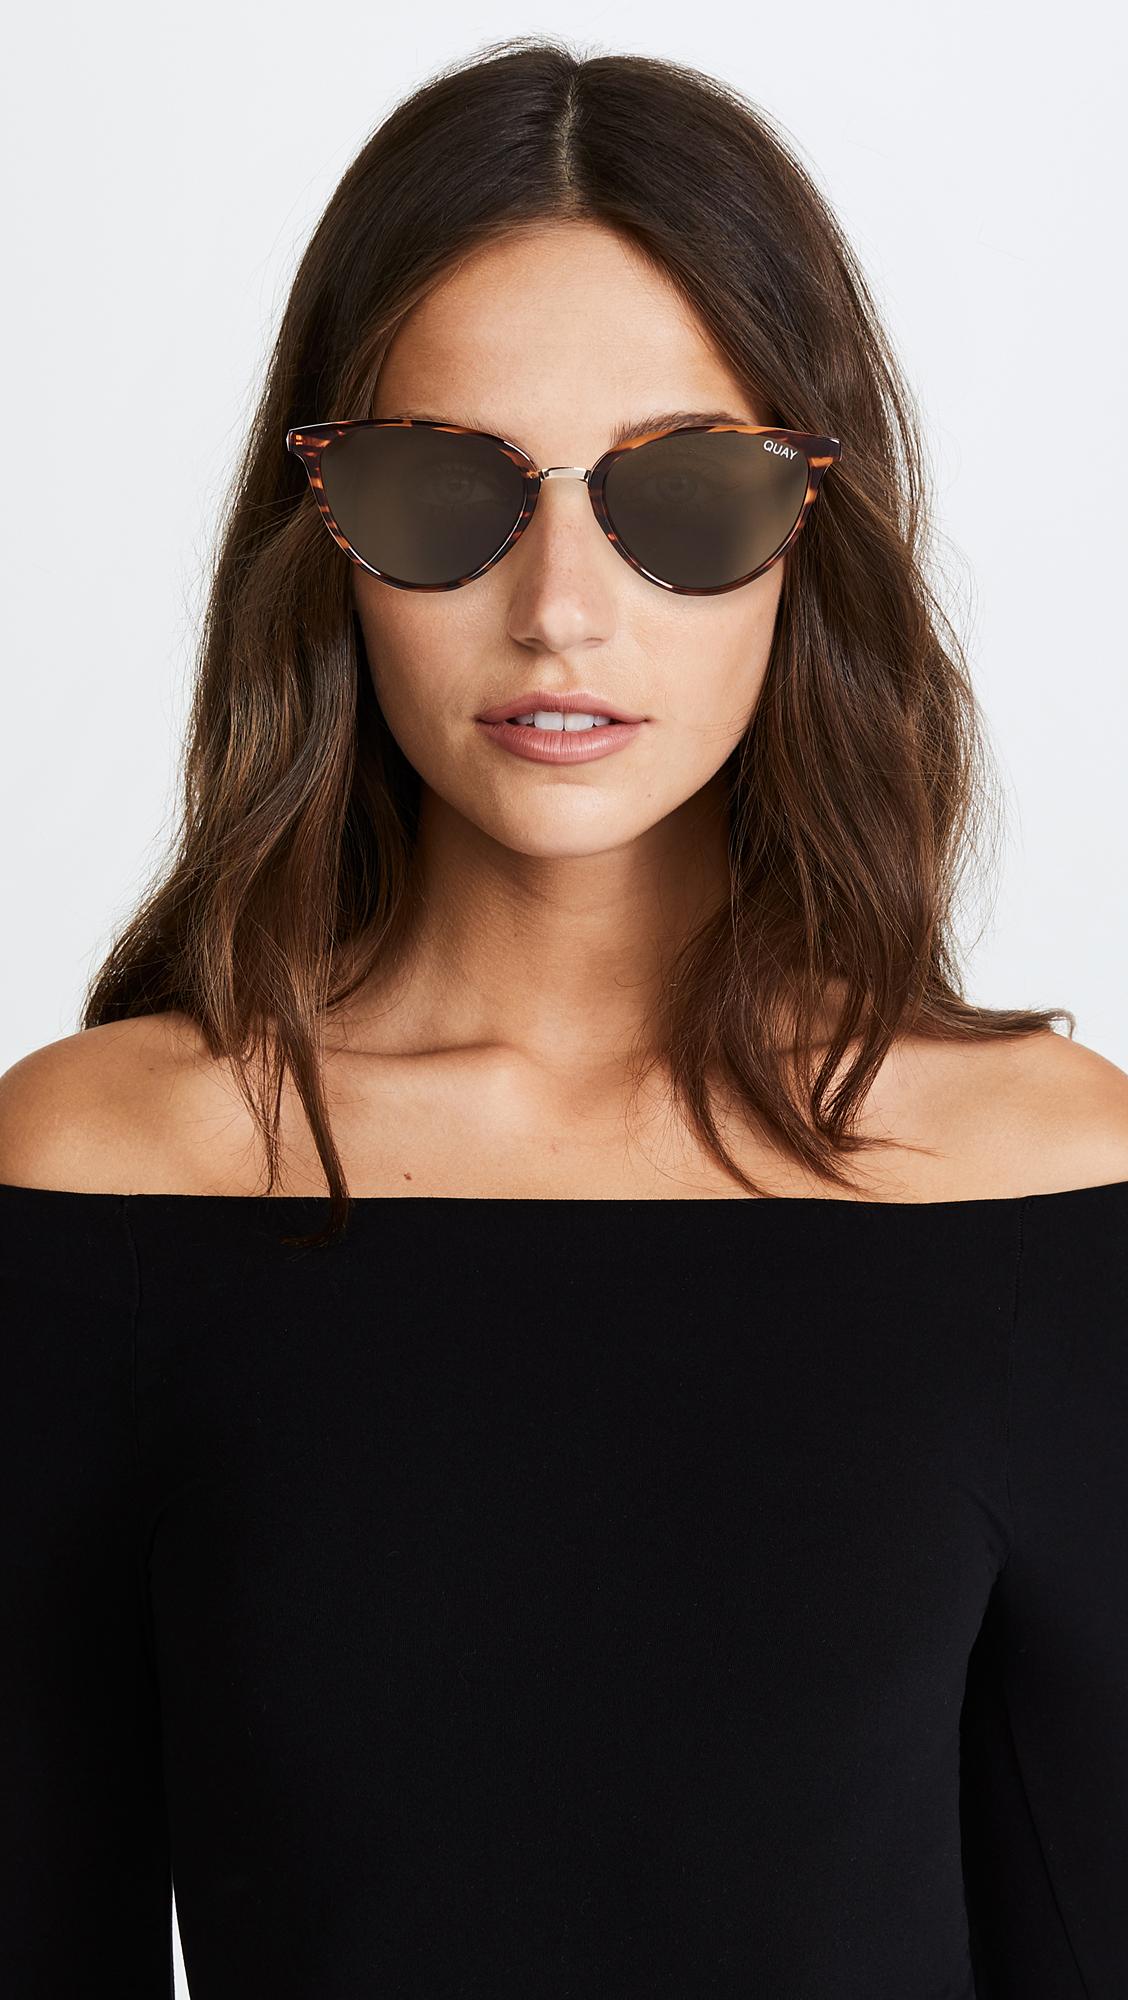 b972c26207 Quay Rumors Sunglasses